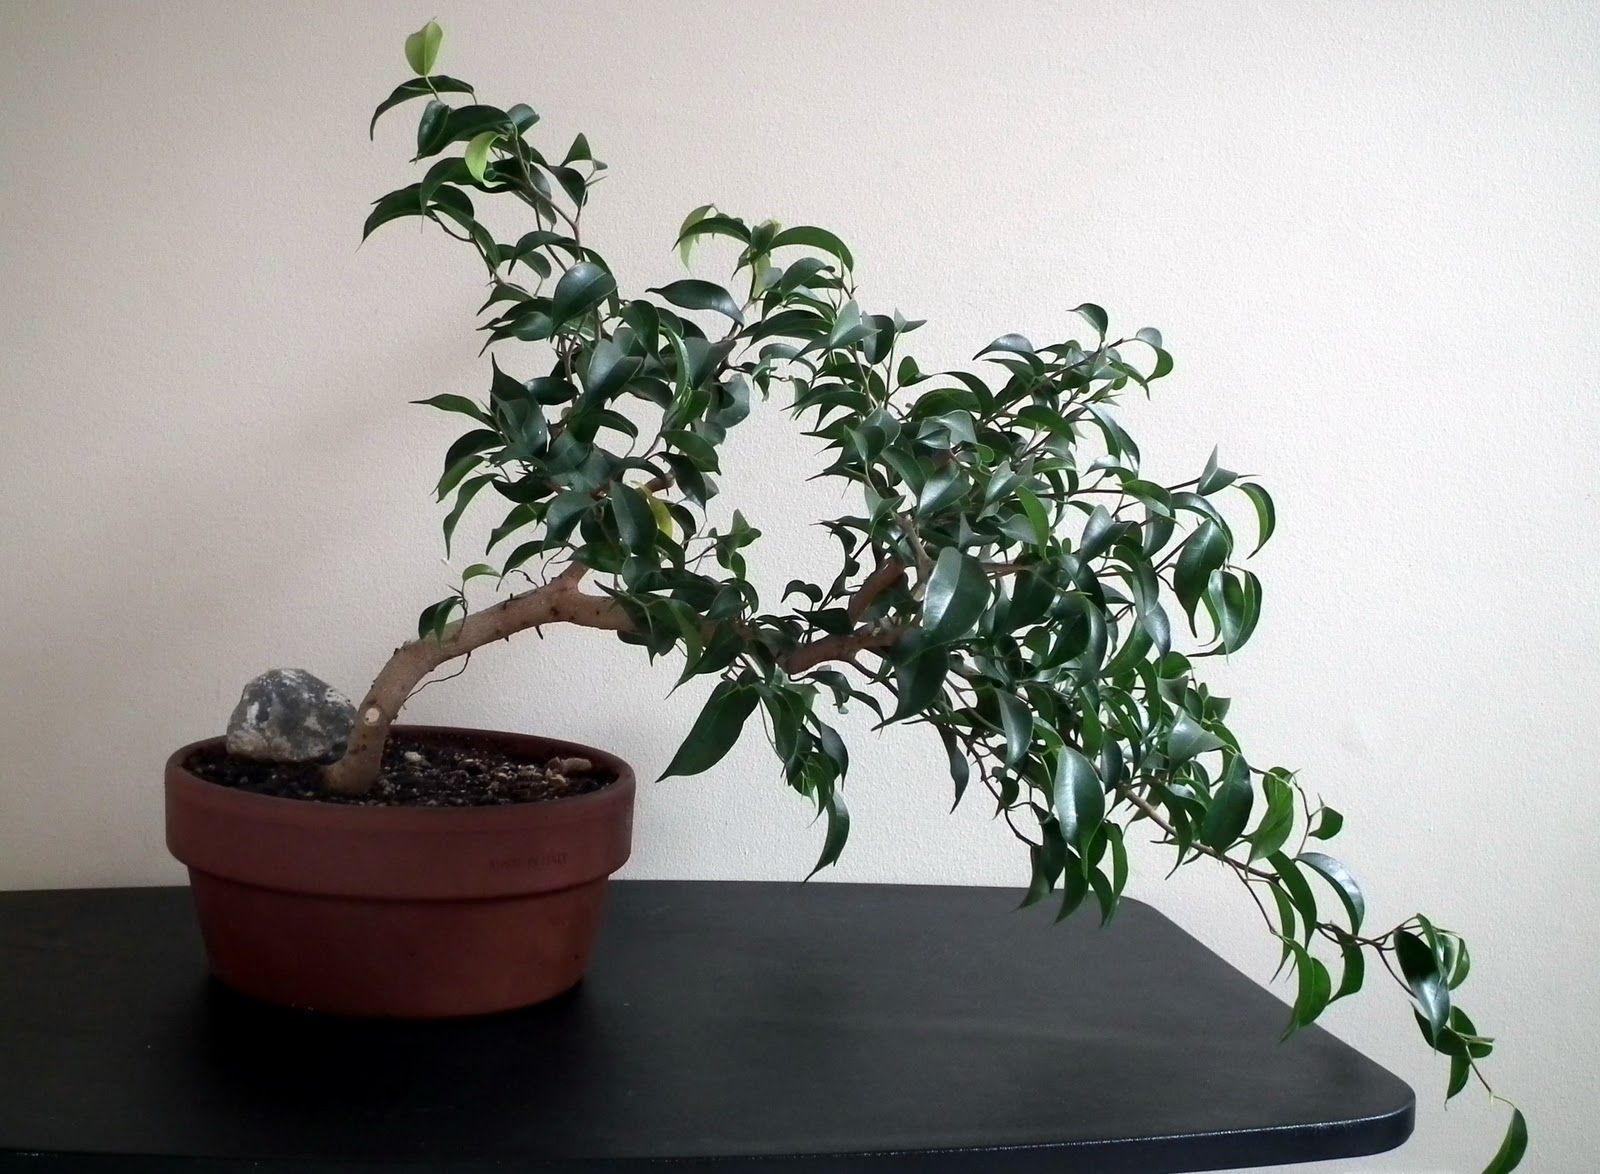 Bonsai Tree Ficus Ginseng Bonsai With Ginseng Ficus Bonsai Tree Ficus Ginseng Bonsai Ficus Bonsai Tree Ficus